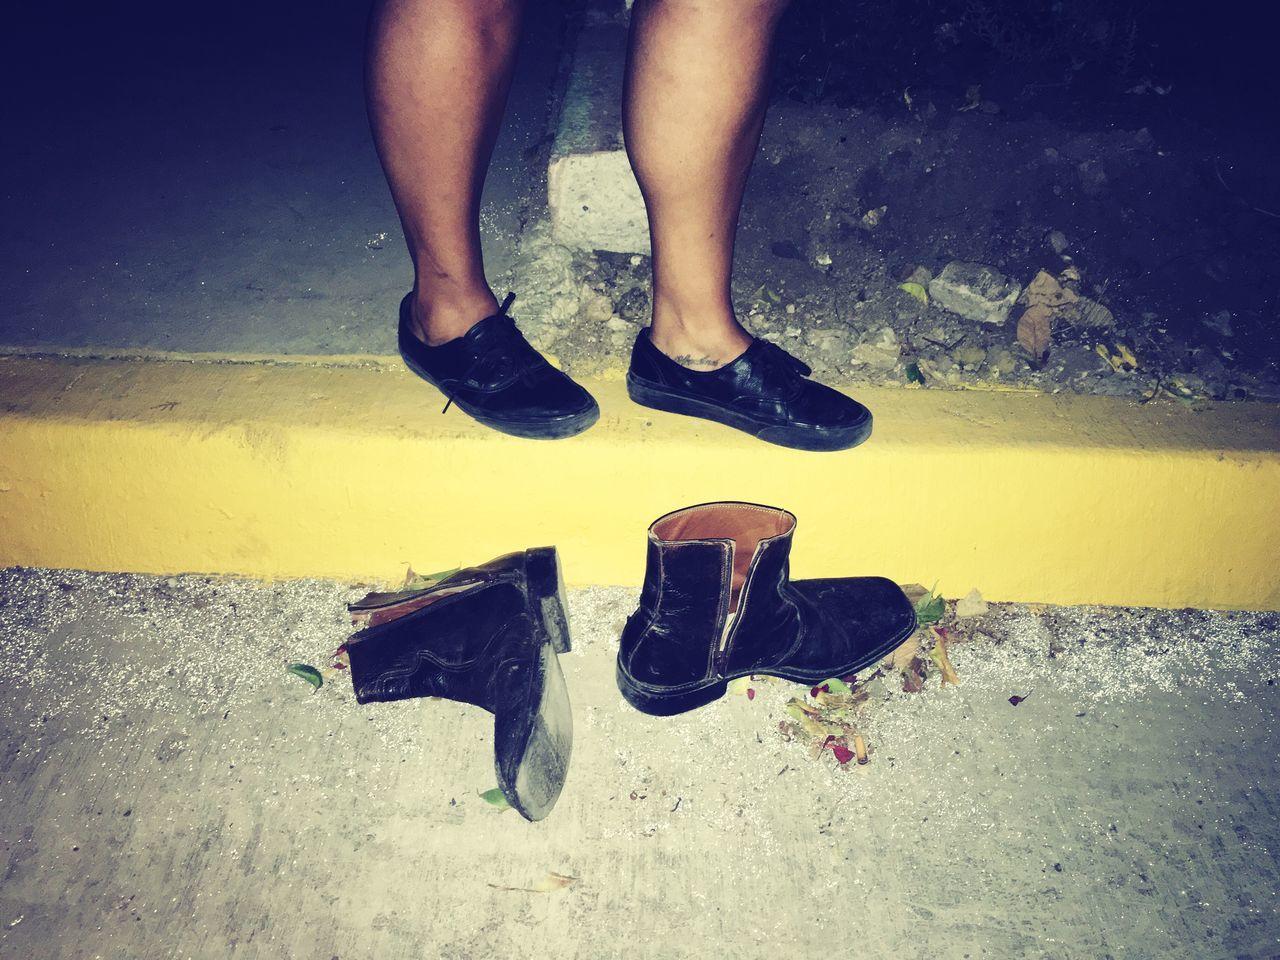 Human Leg Shoe One Person Real People Human Body Part Pair Yellow Human Foot Disfrutando De La Vida Boots Vans Street IPhone I put my best pair of shoes... 🎤🎼💃🏻❤️🖤